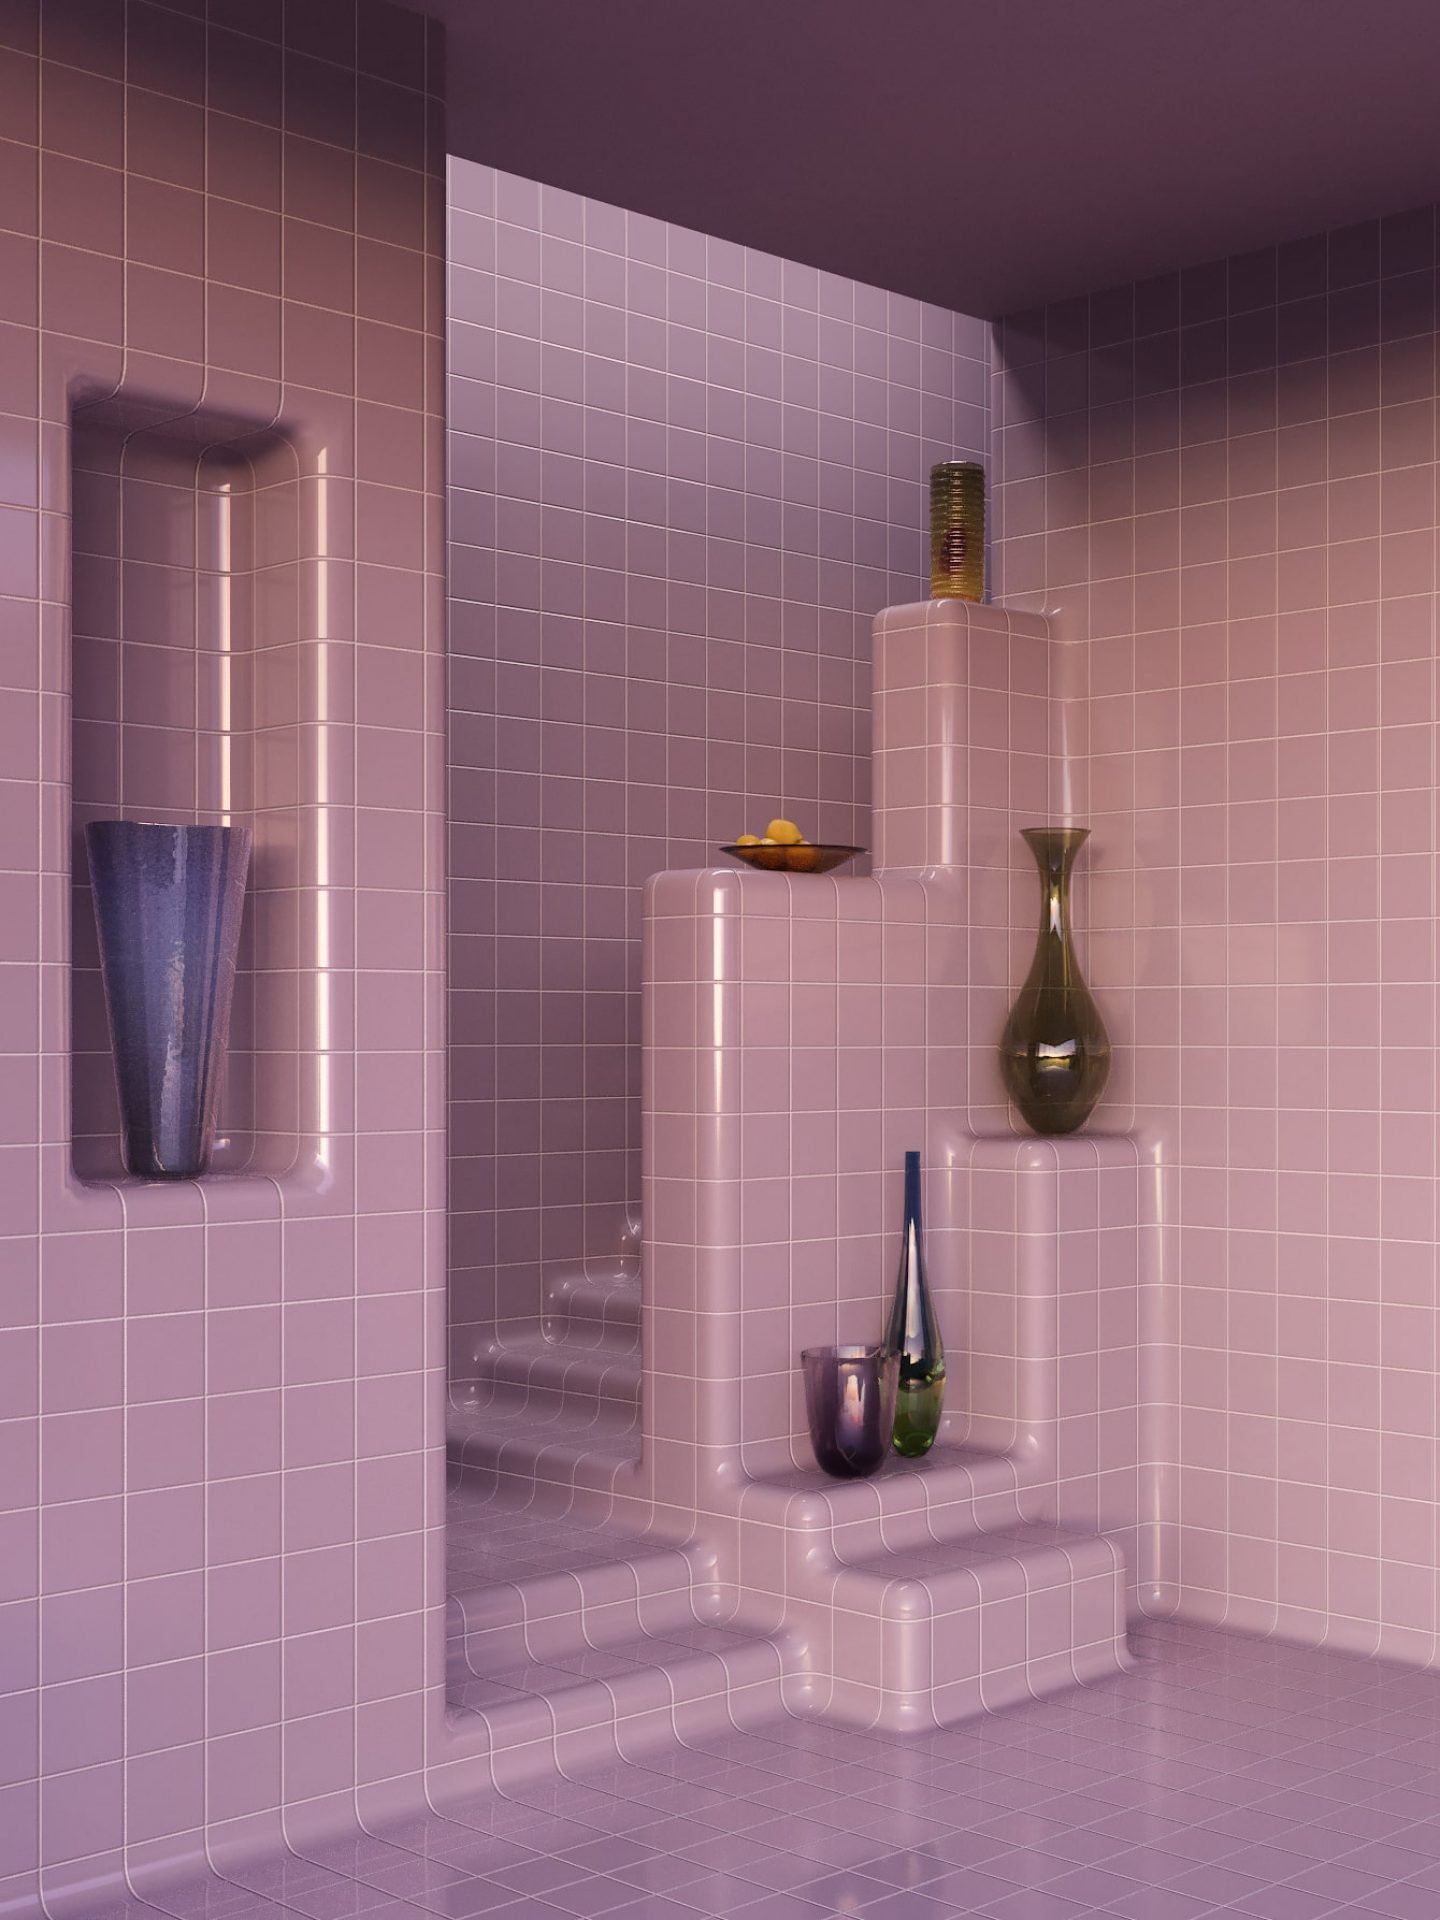 IGNANT-Design-CharlotteTaylor-15